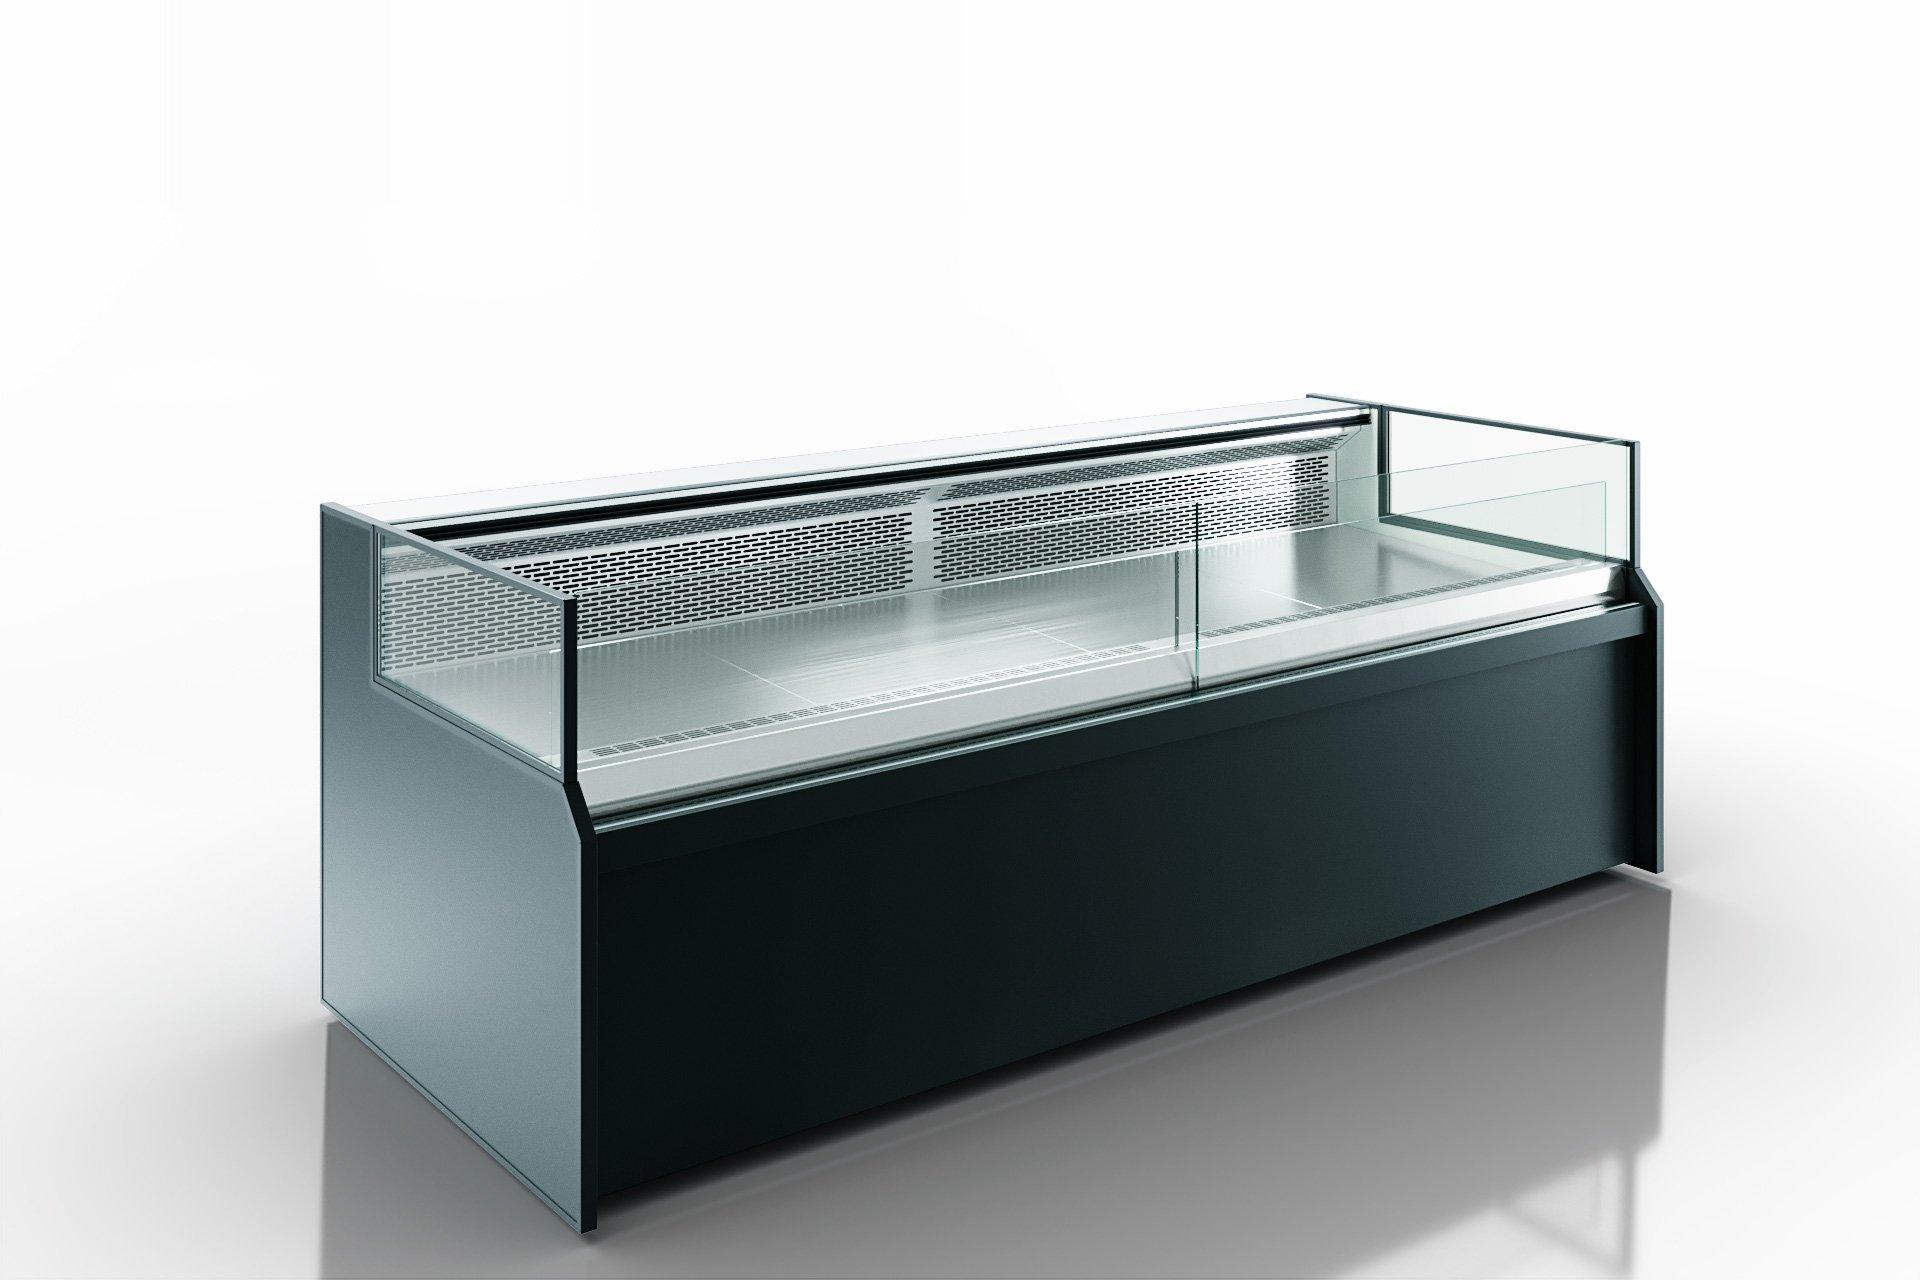 Refrigeration сounters Missouri MC 100 deli self 093-DBM/DBA